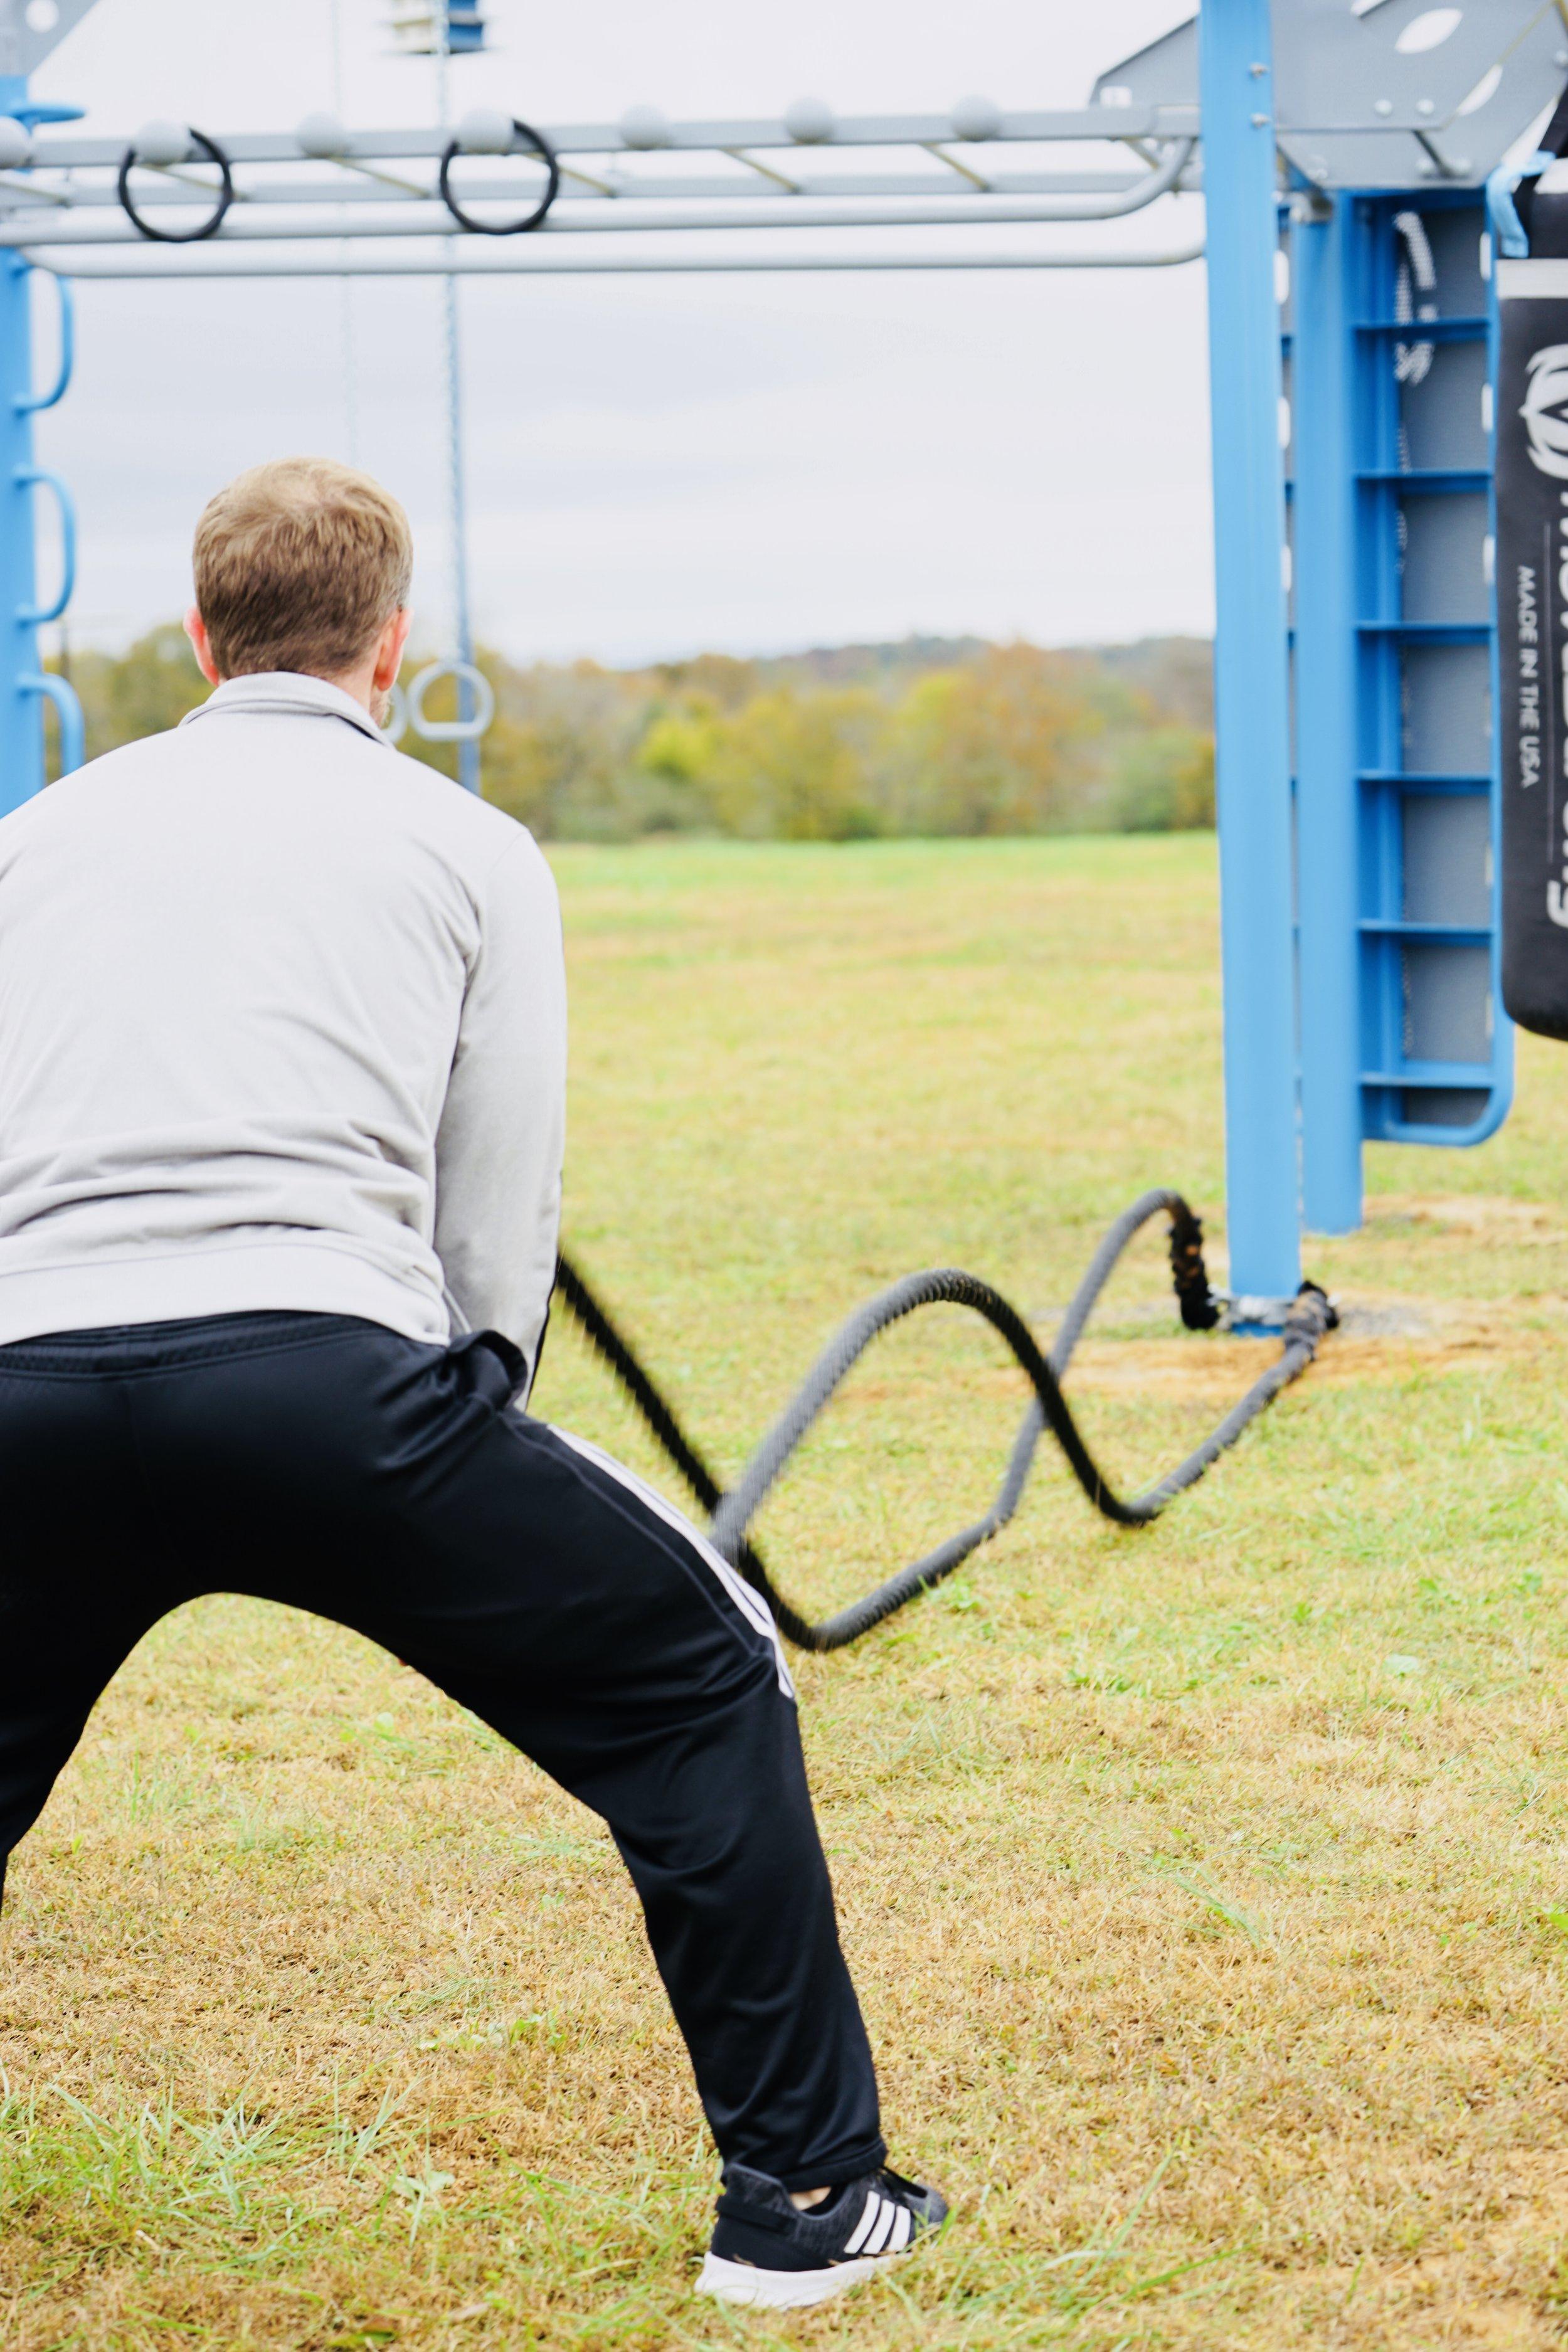 Outdoor power battle rope